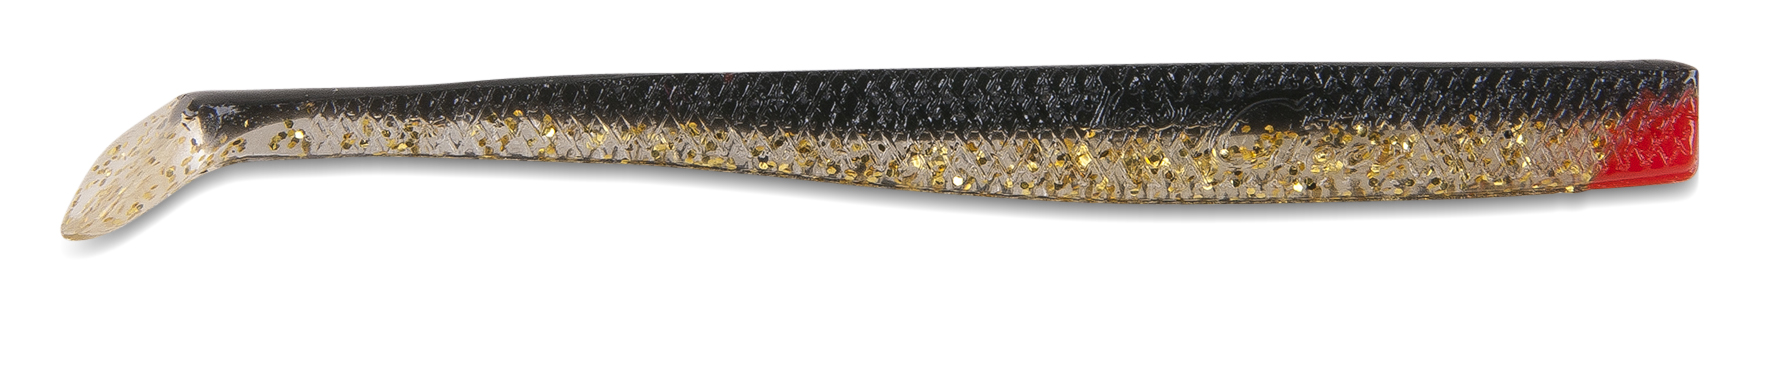 Iron Claw gumová nástraha Skinny Jake 11cm Vzor RM, 3ks